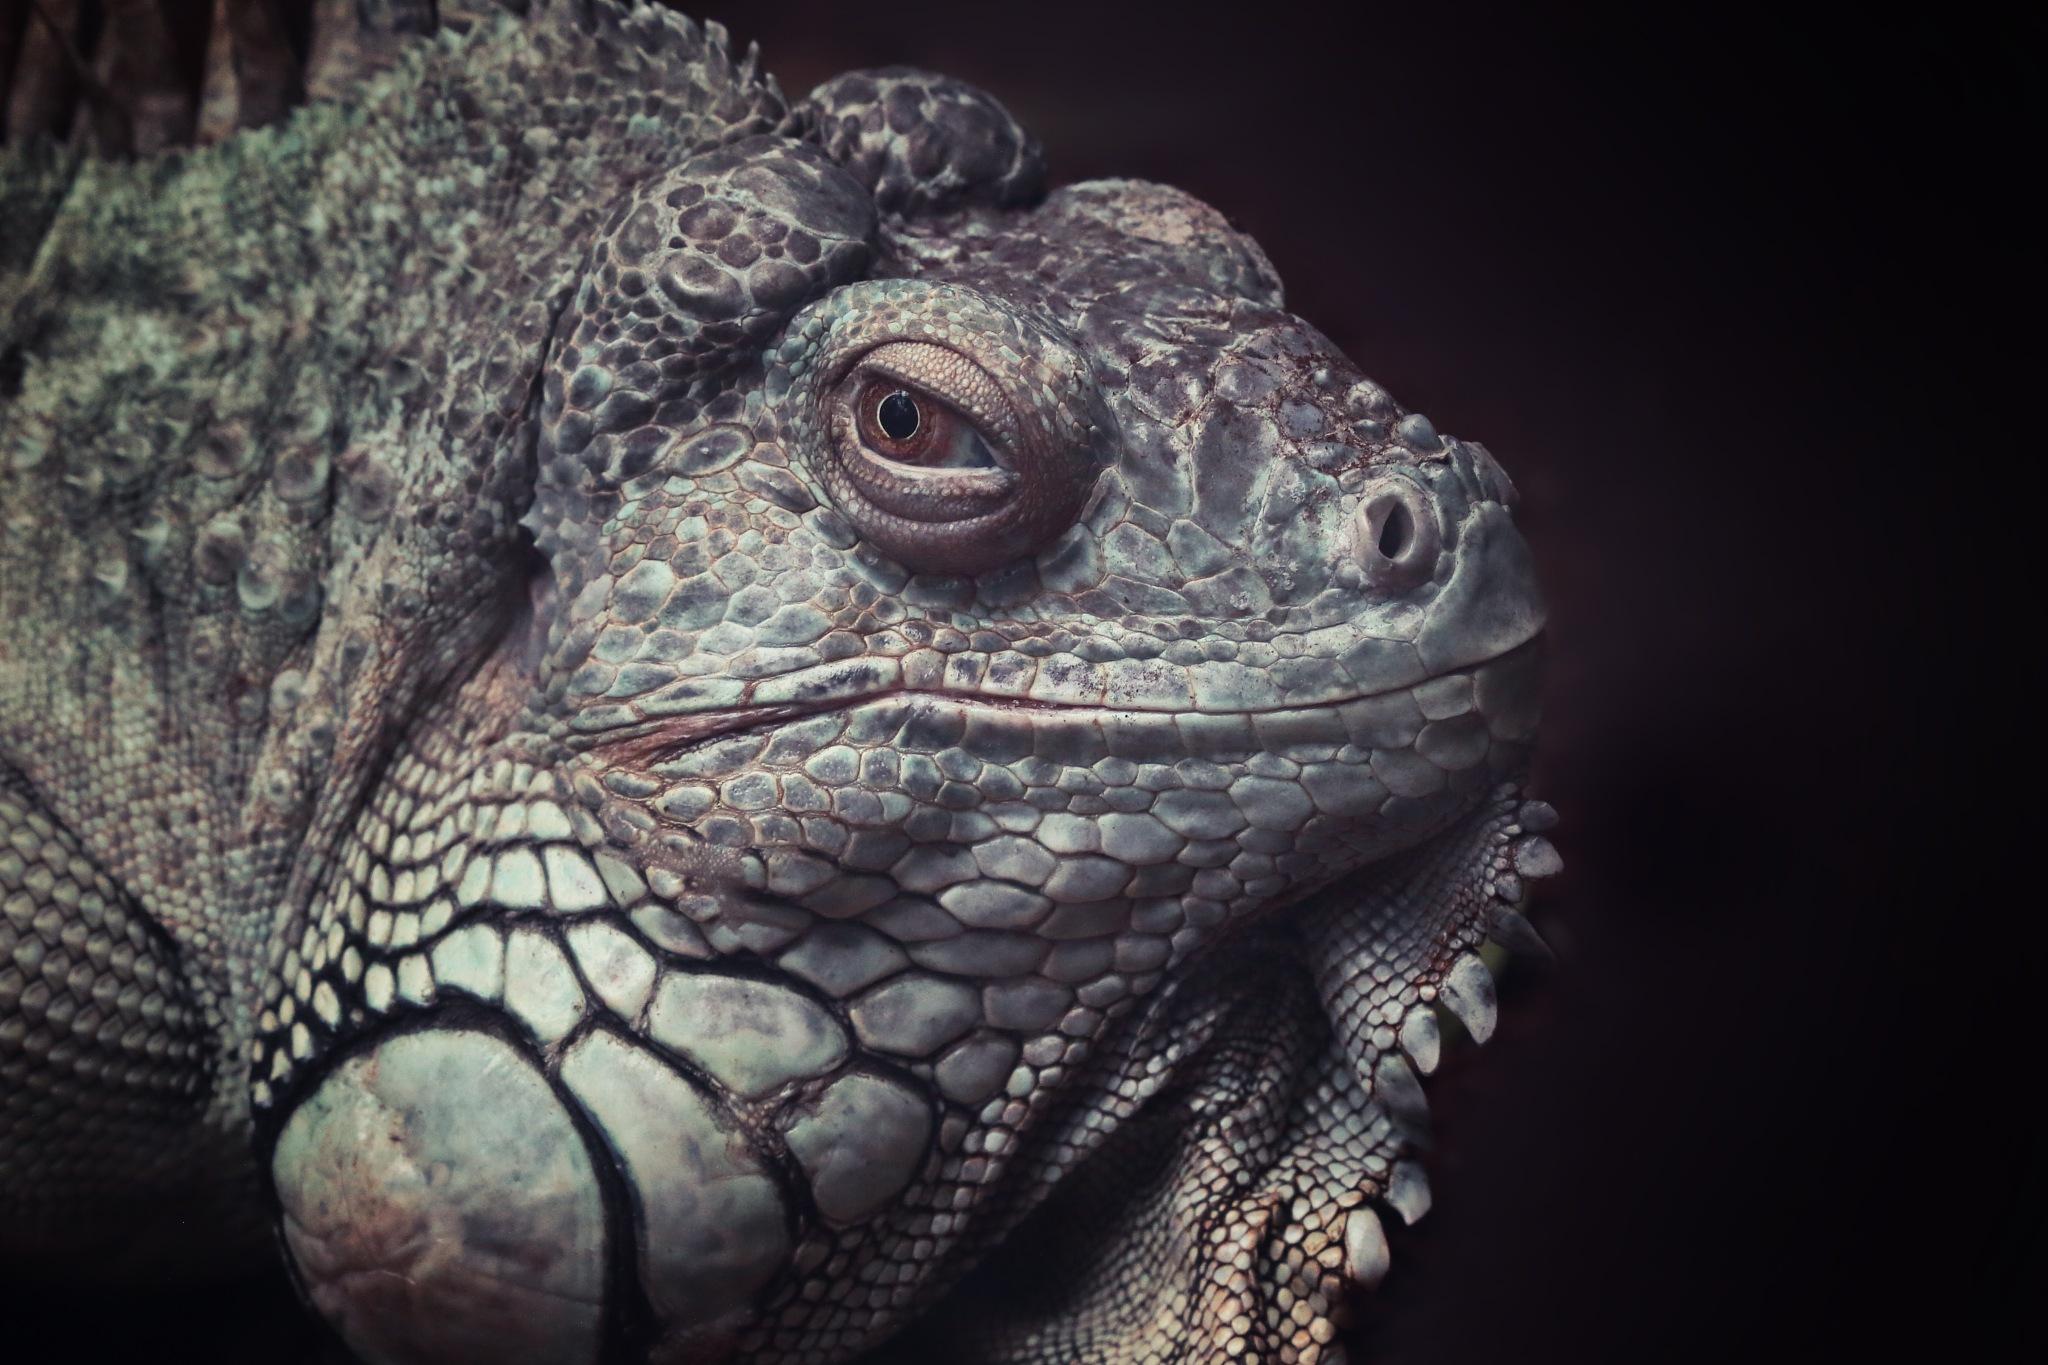 Reptile by Henrik T. Sørensen